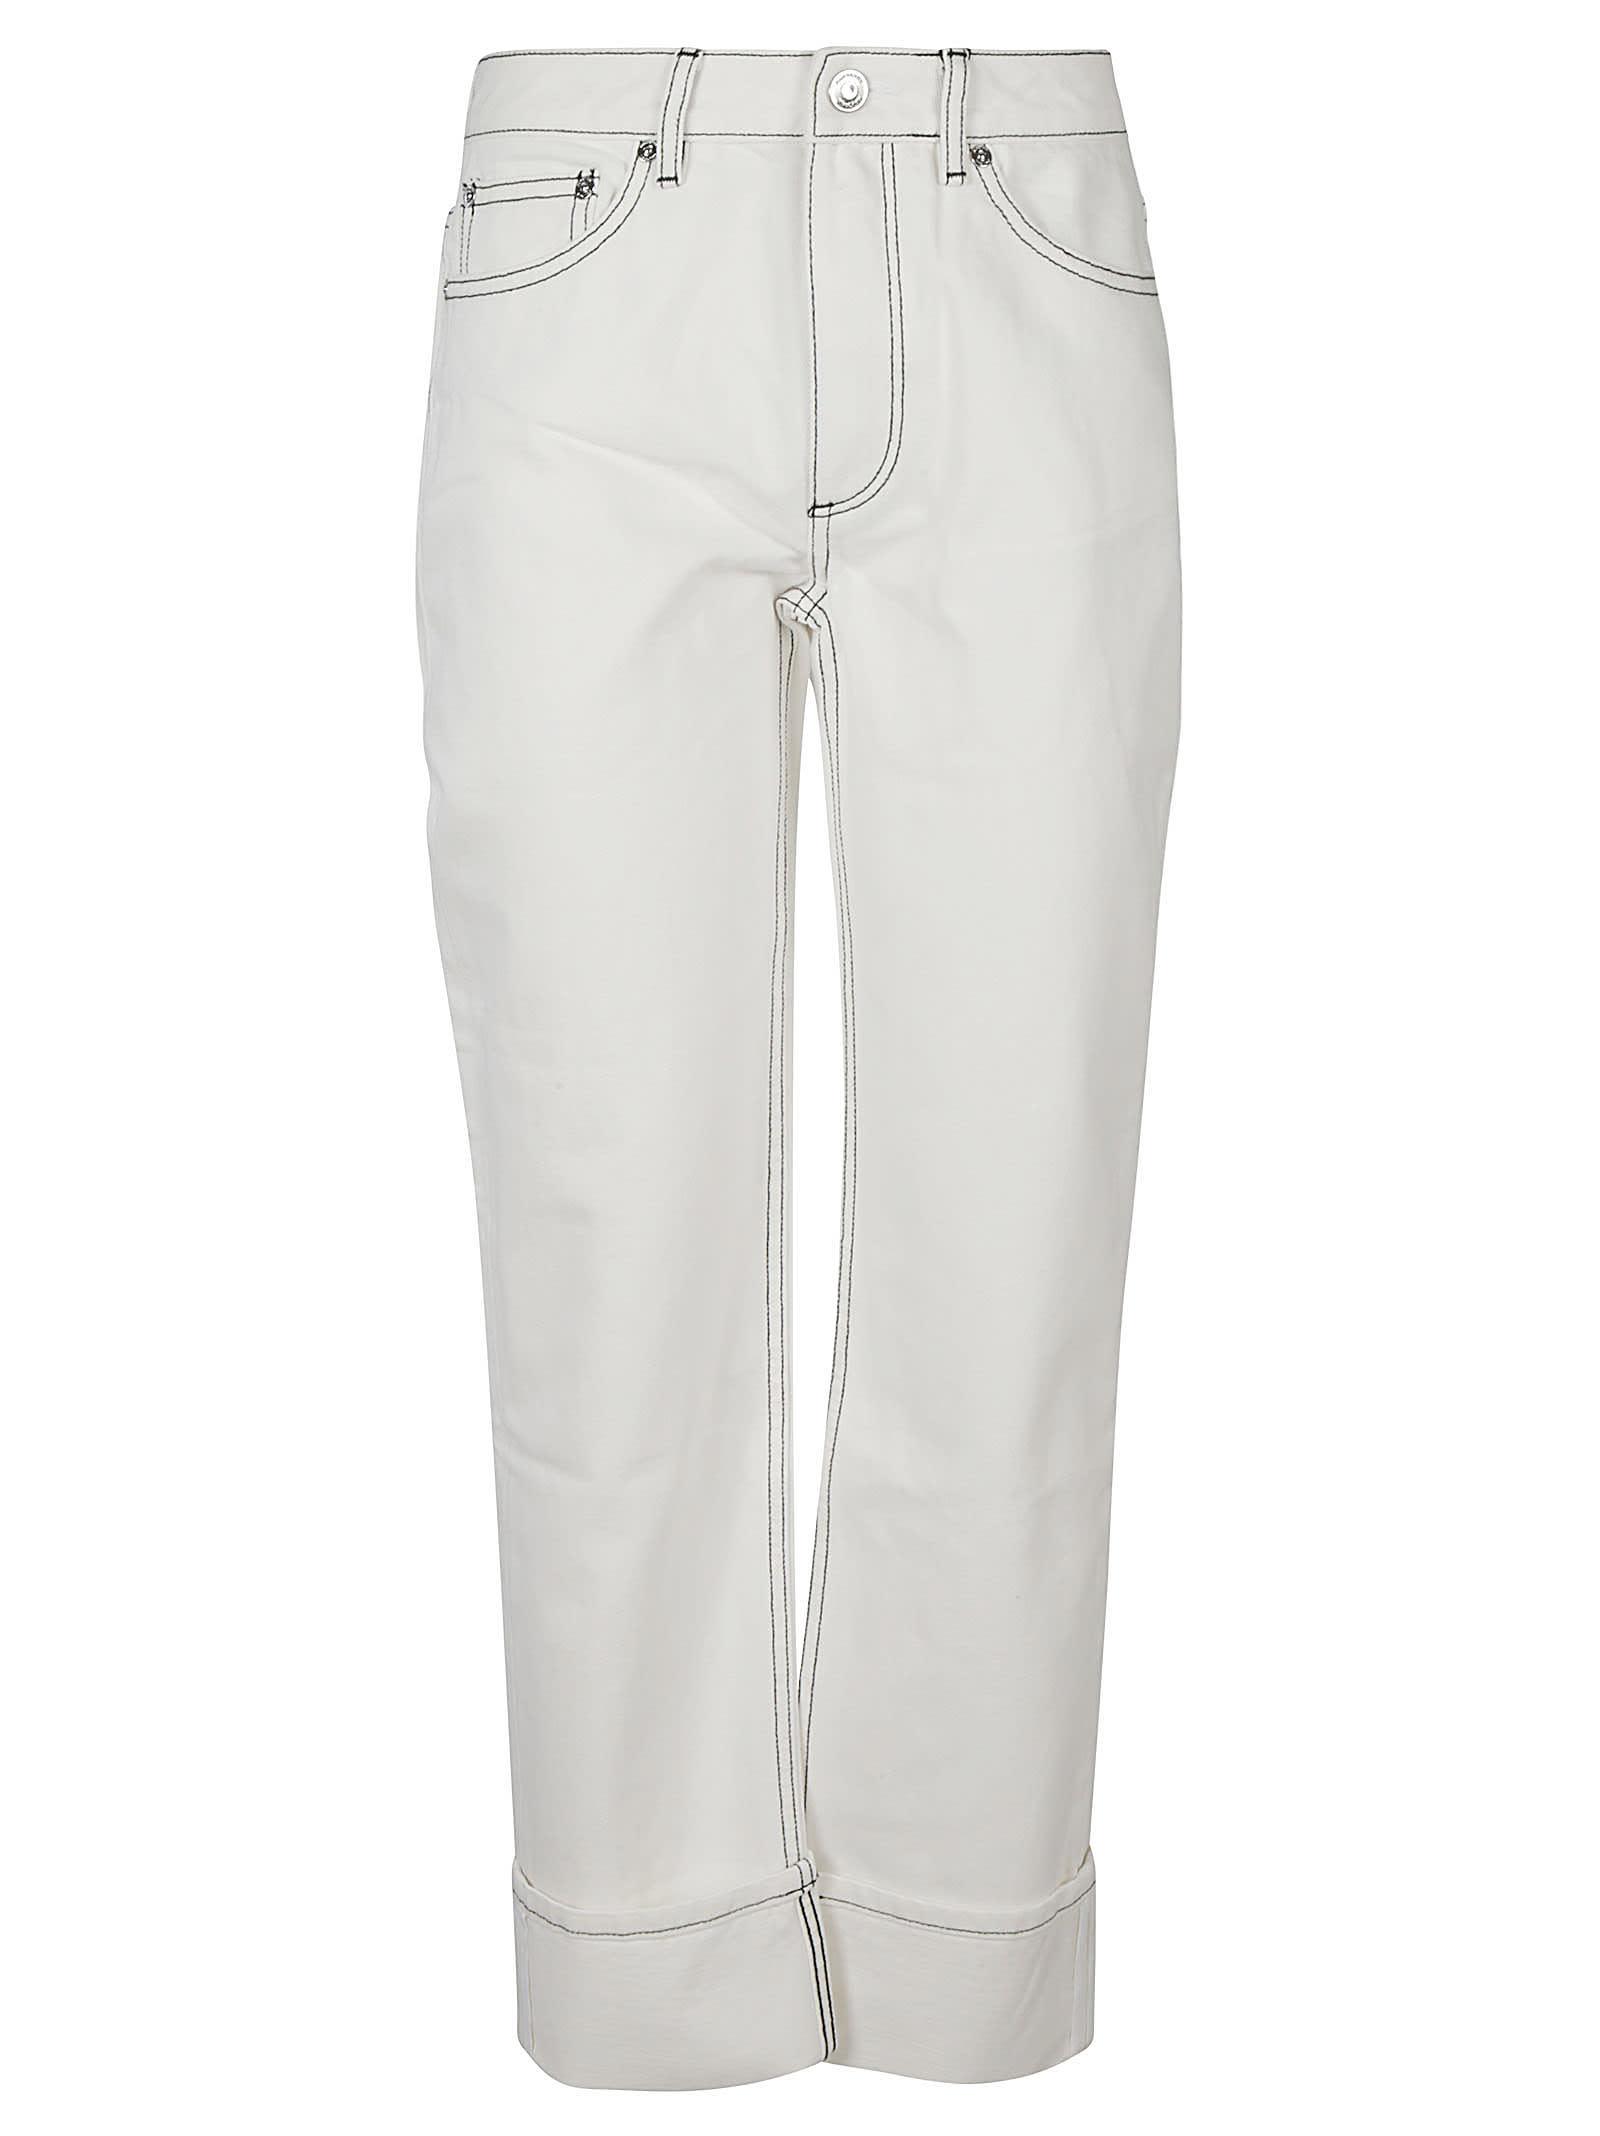 Burberry Marissa Jeans